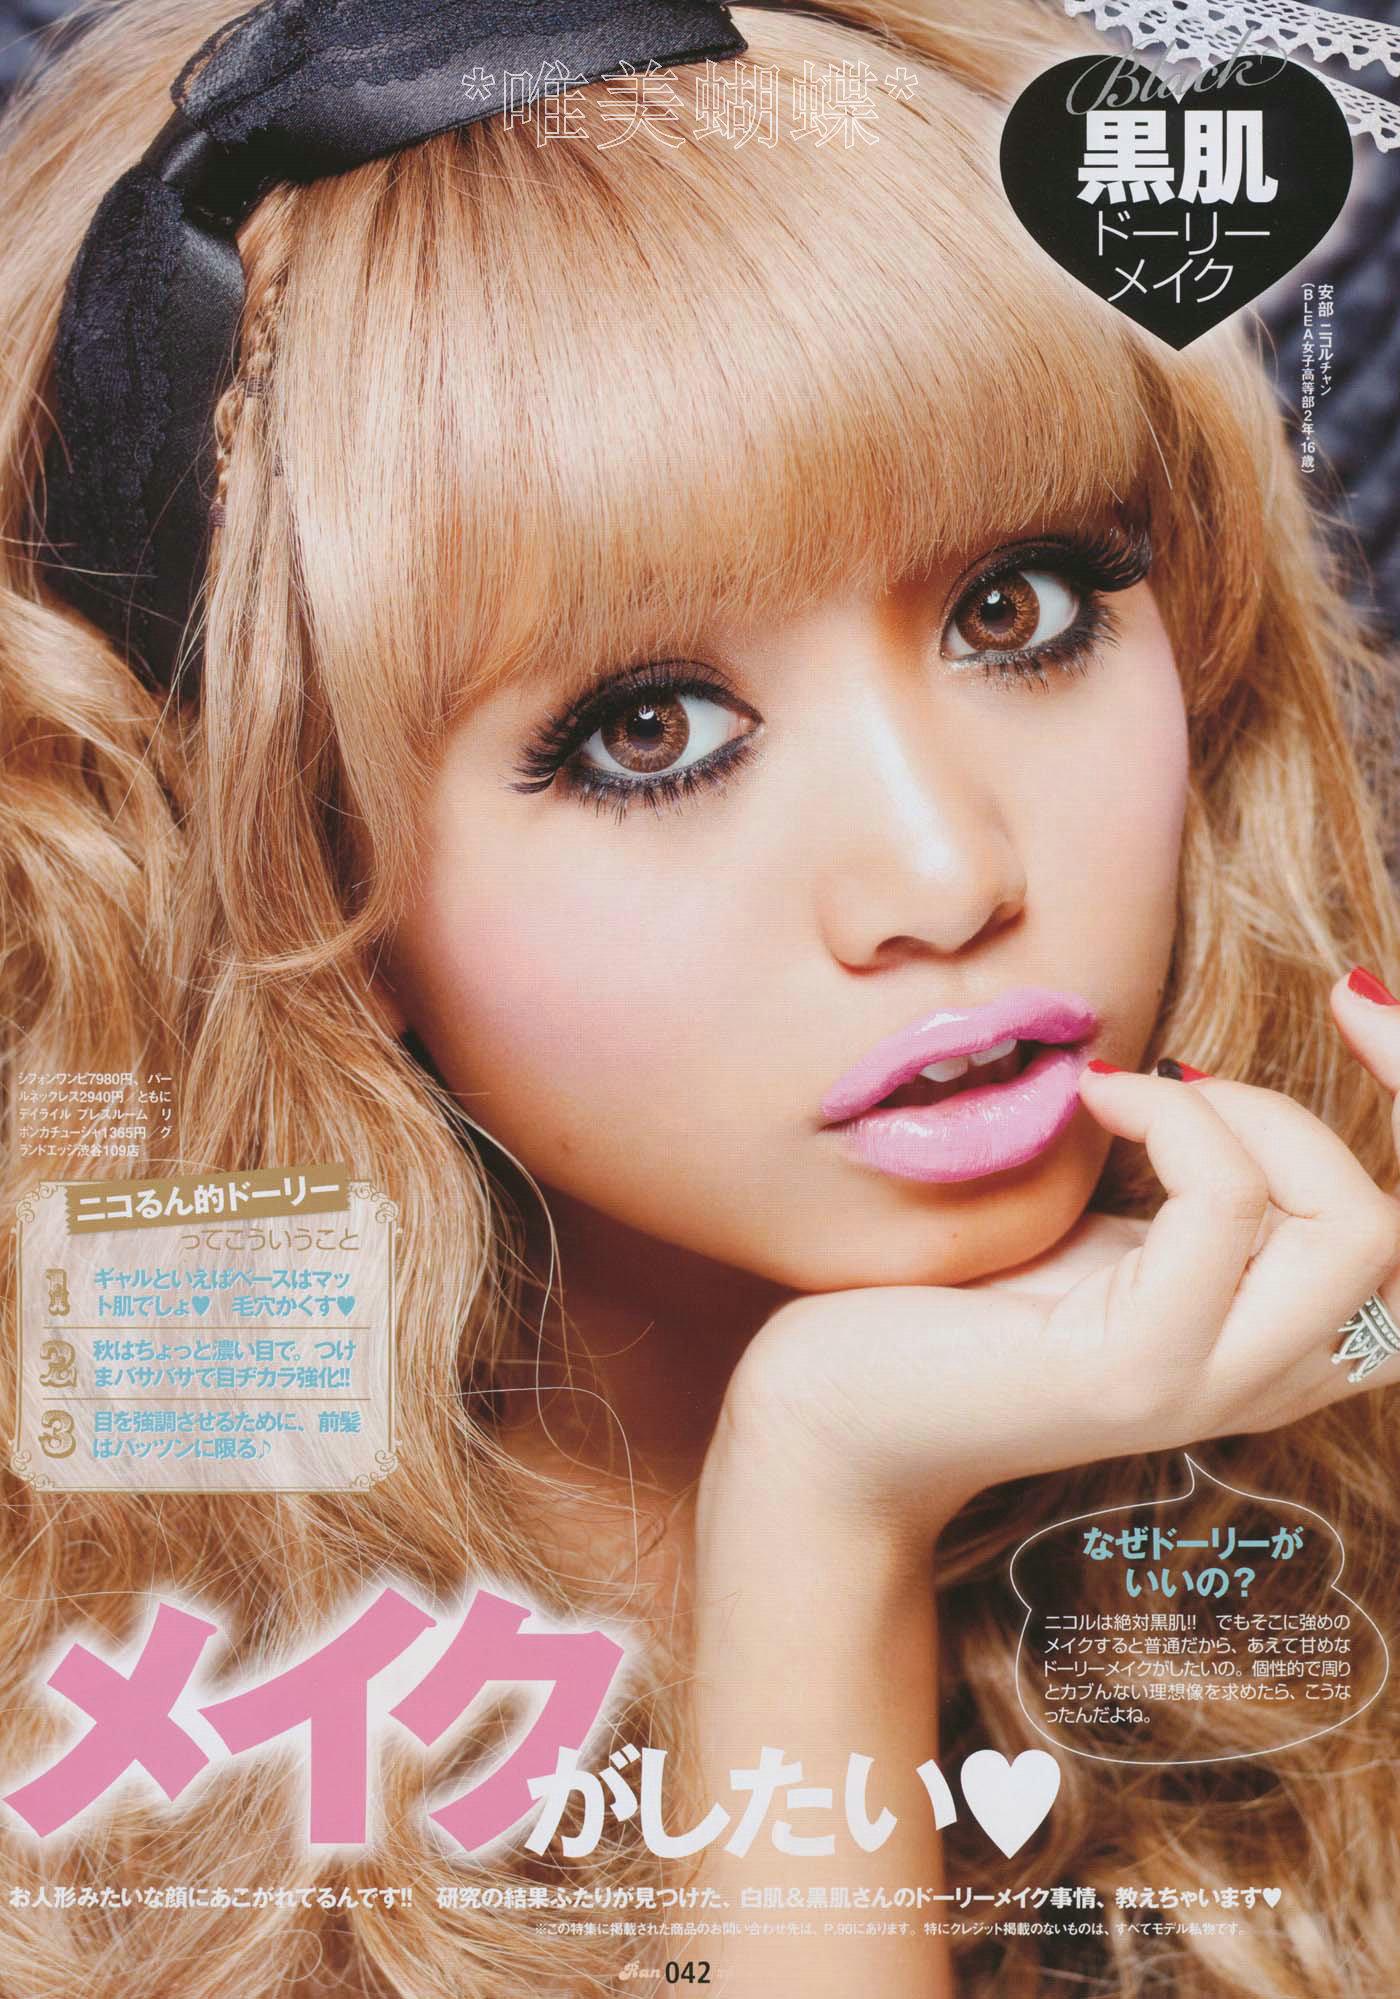 Gyaru-Dolly-Makeup